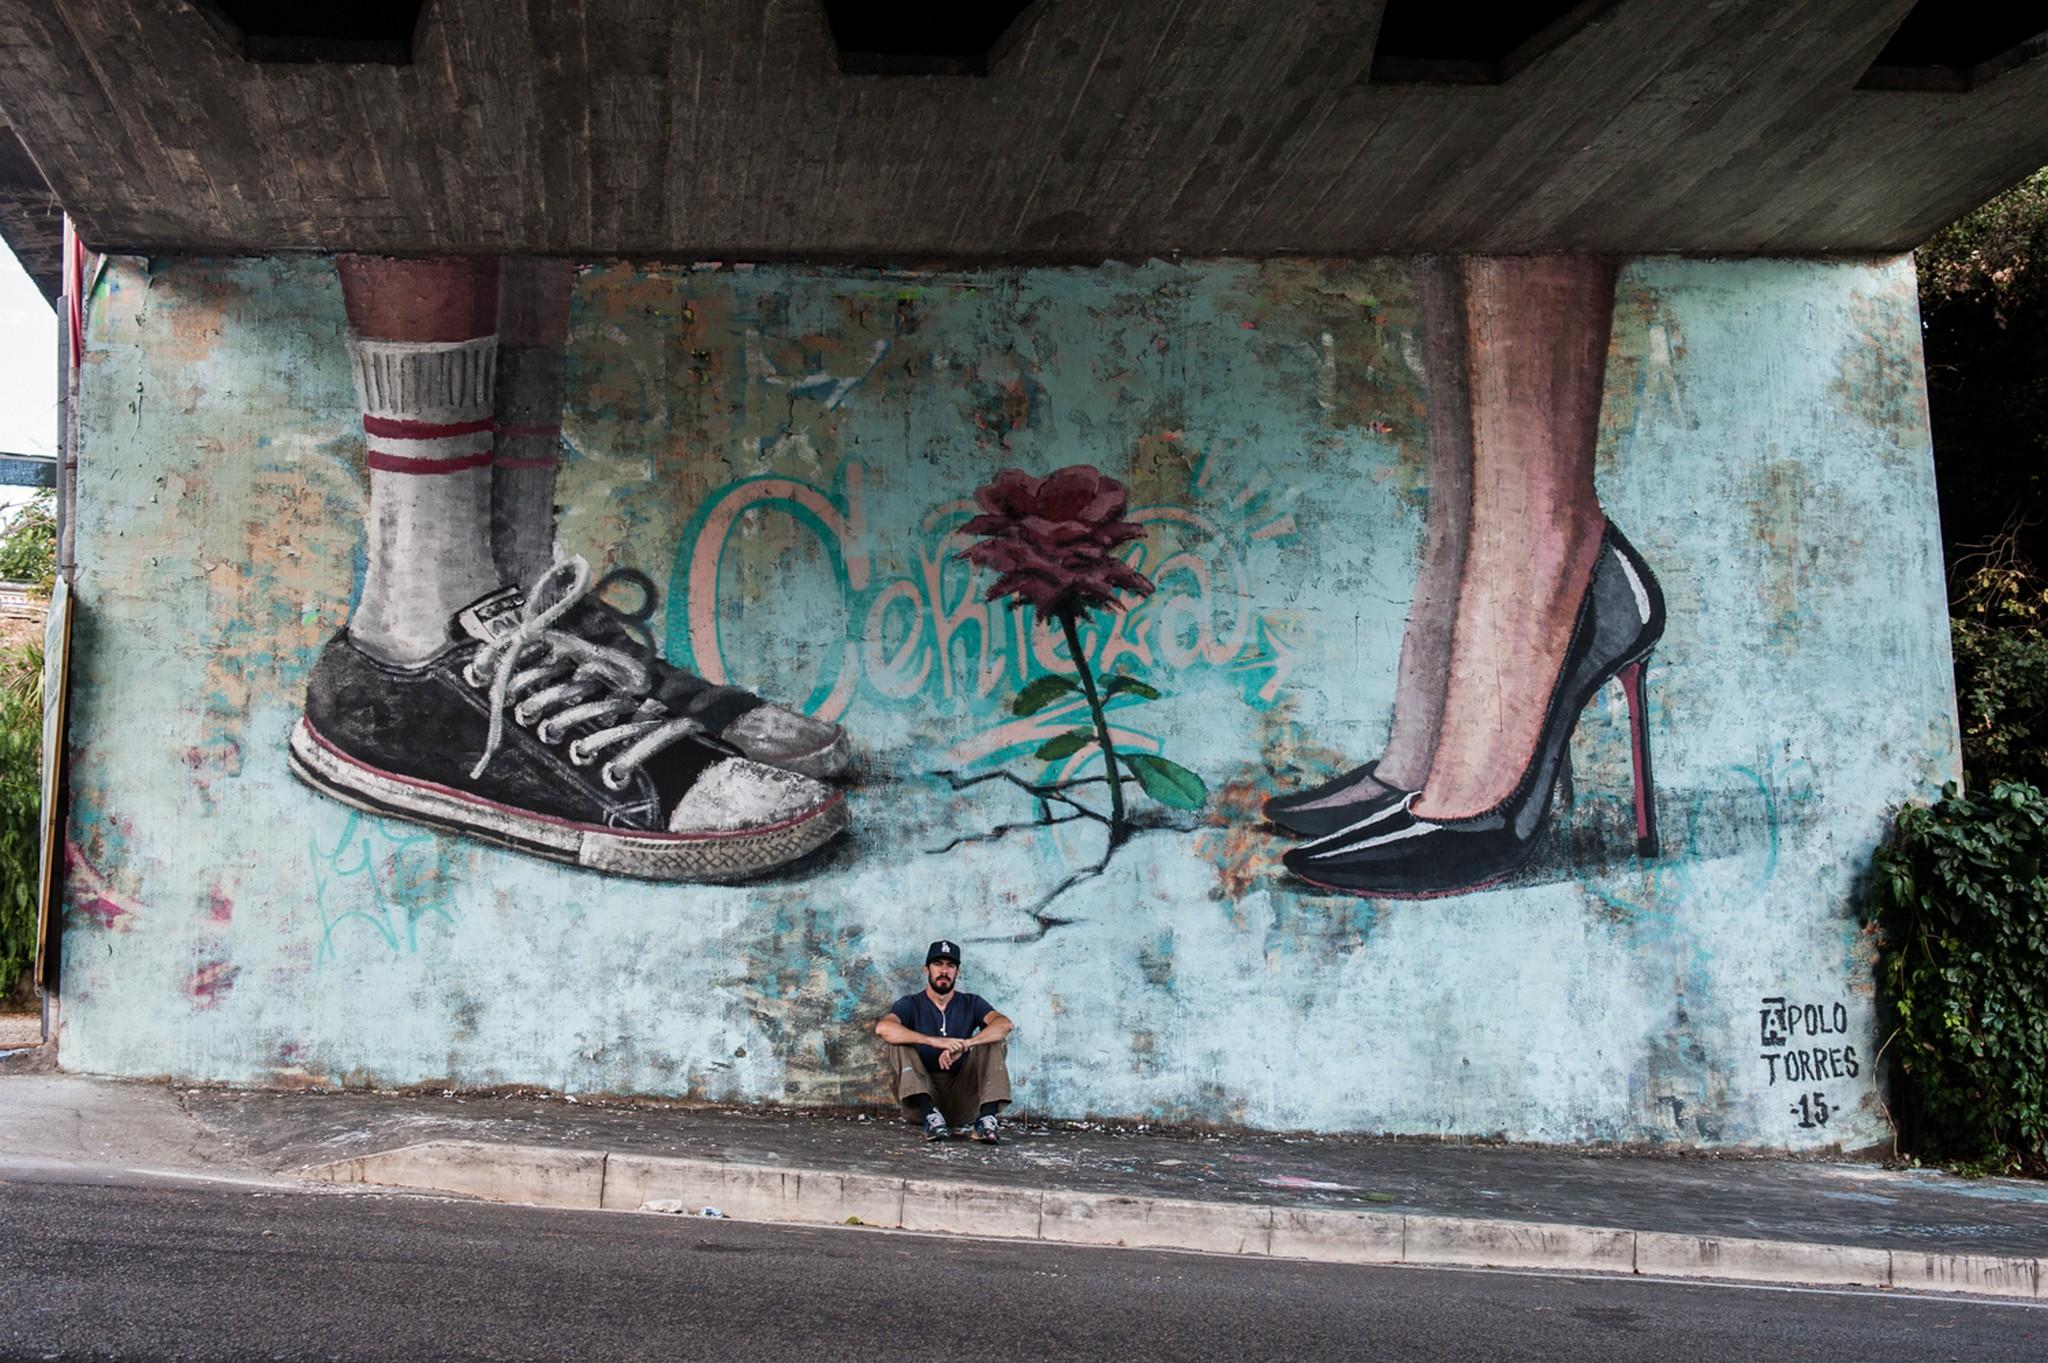 Flavia_Fiengo_memorie urbane00029